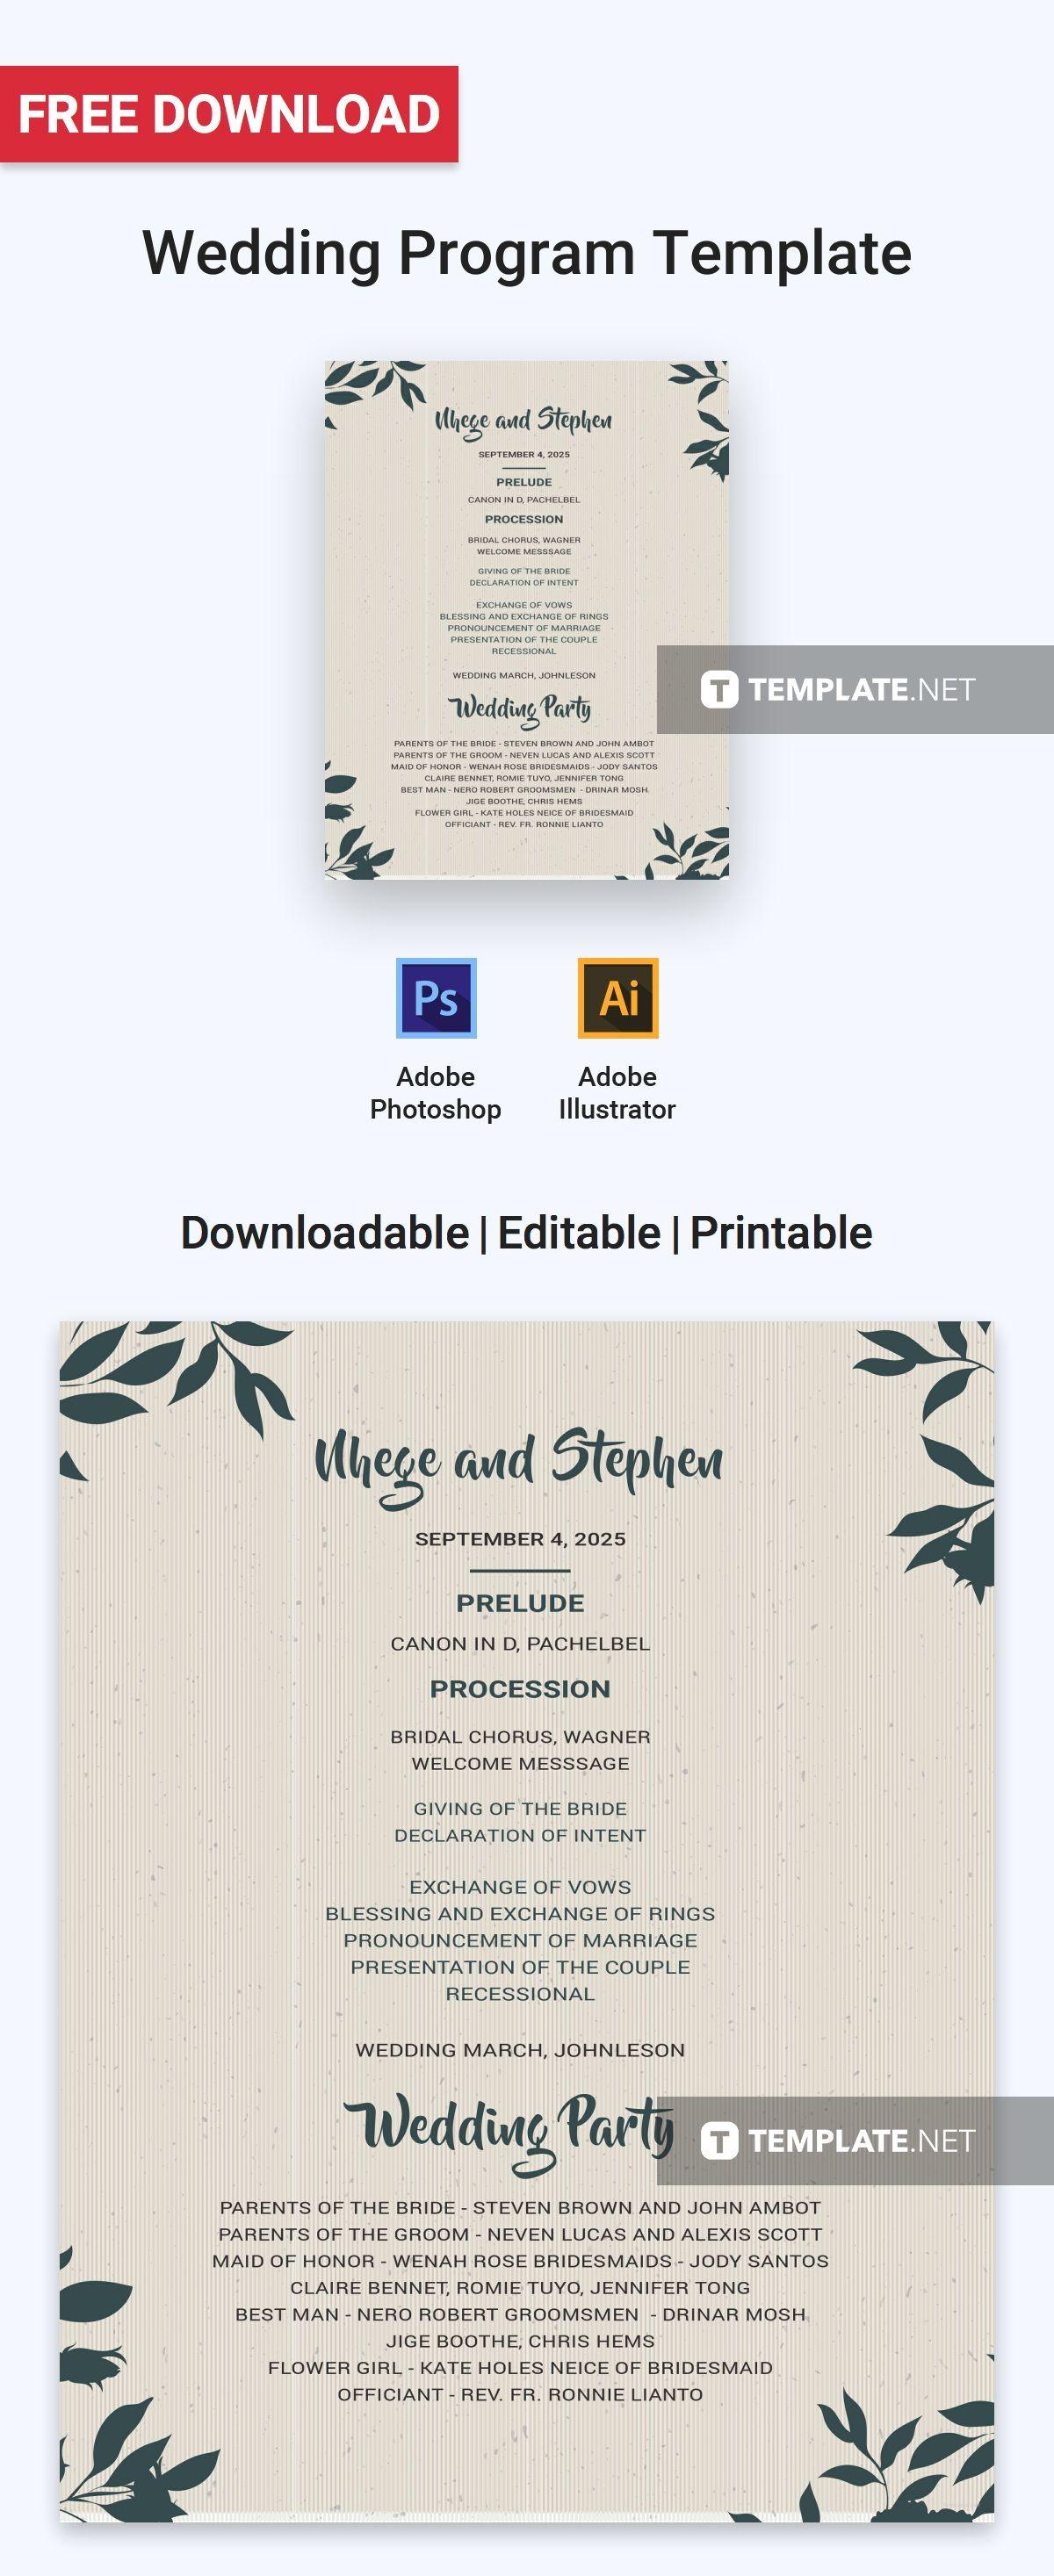 Free Wedding Program In 2018 Free Program Templates Pinterest